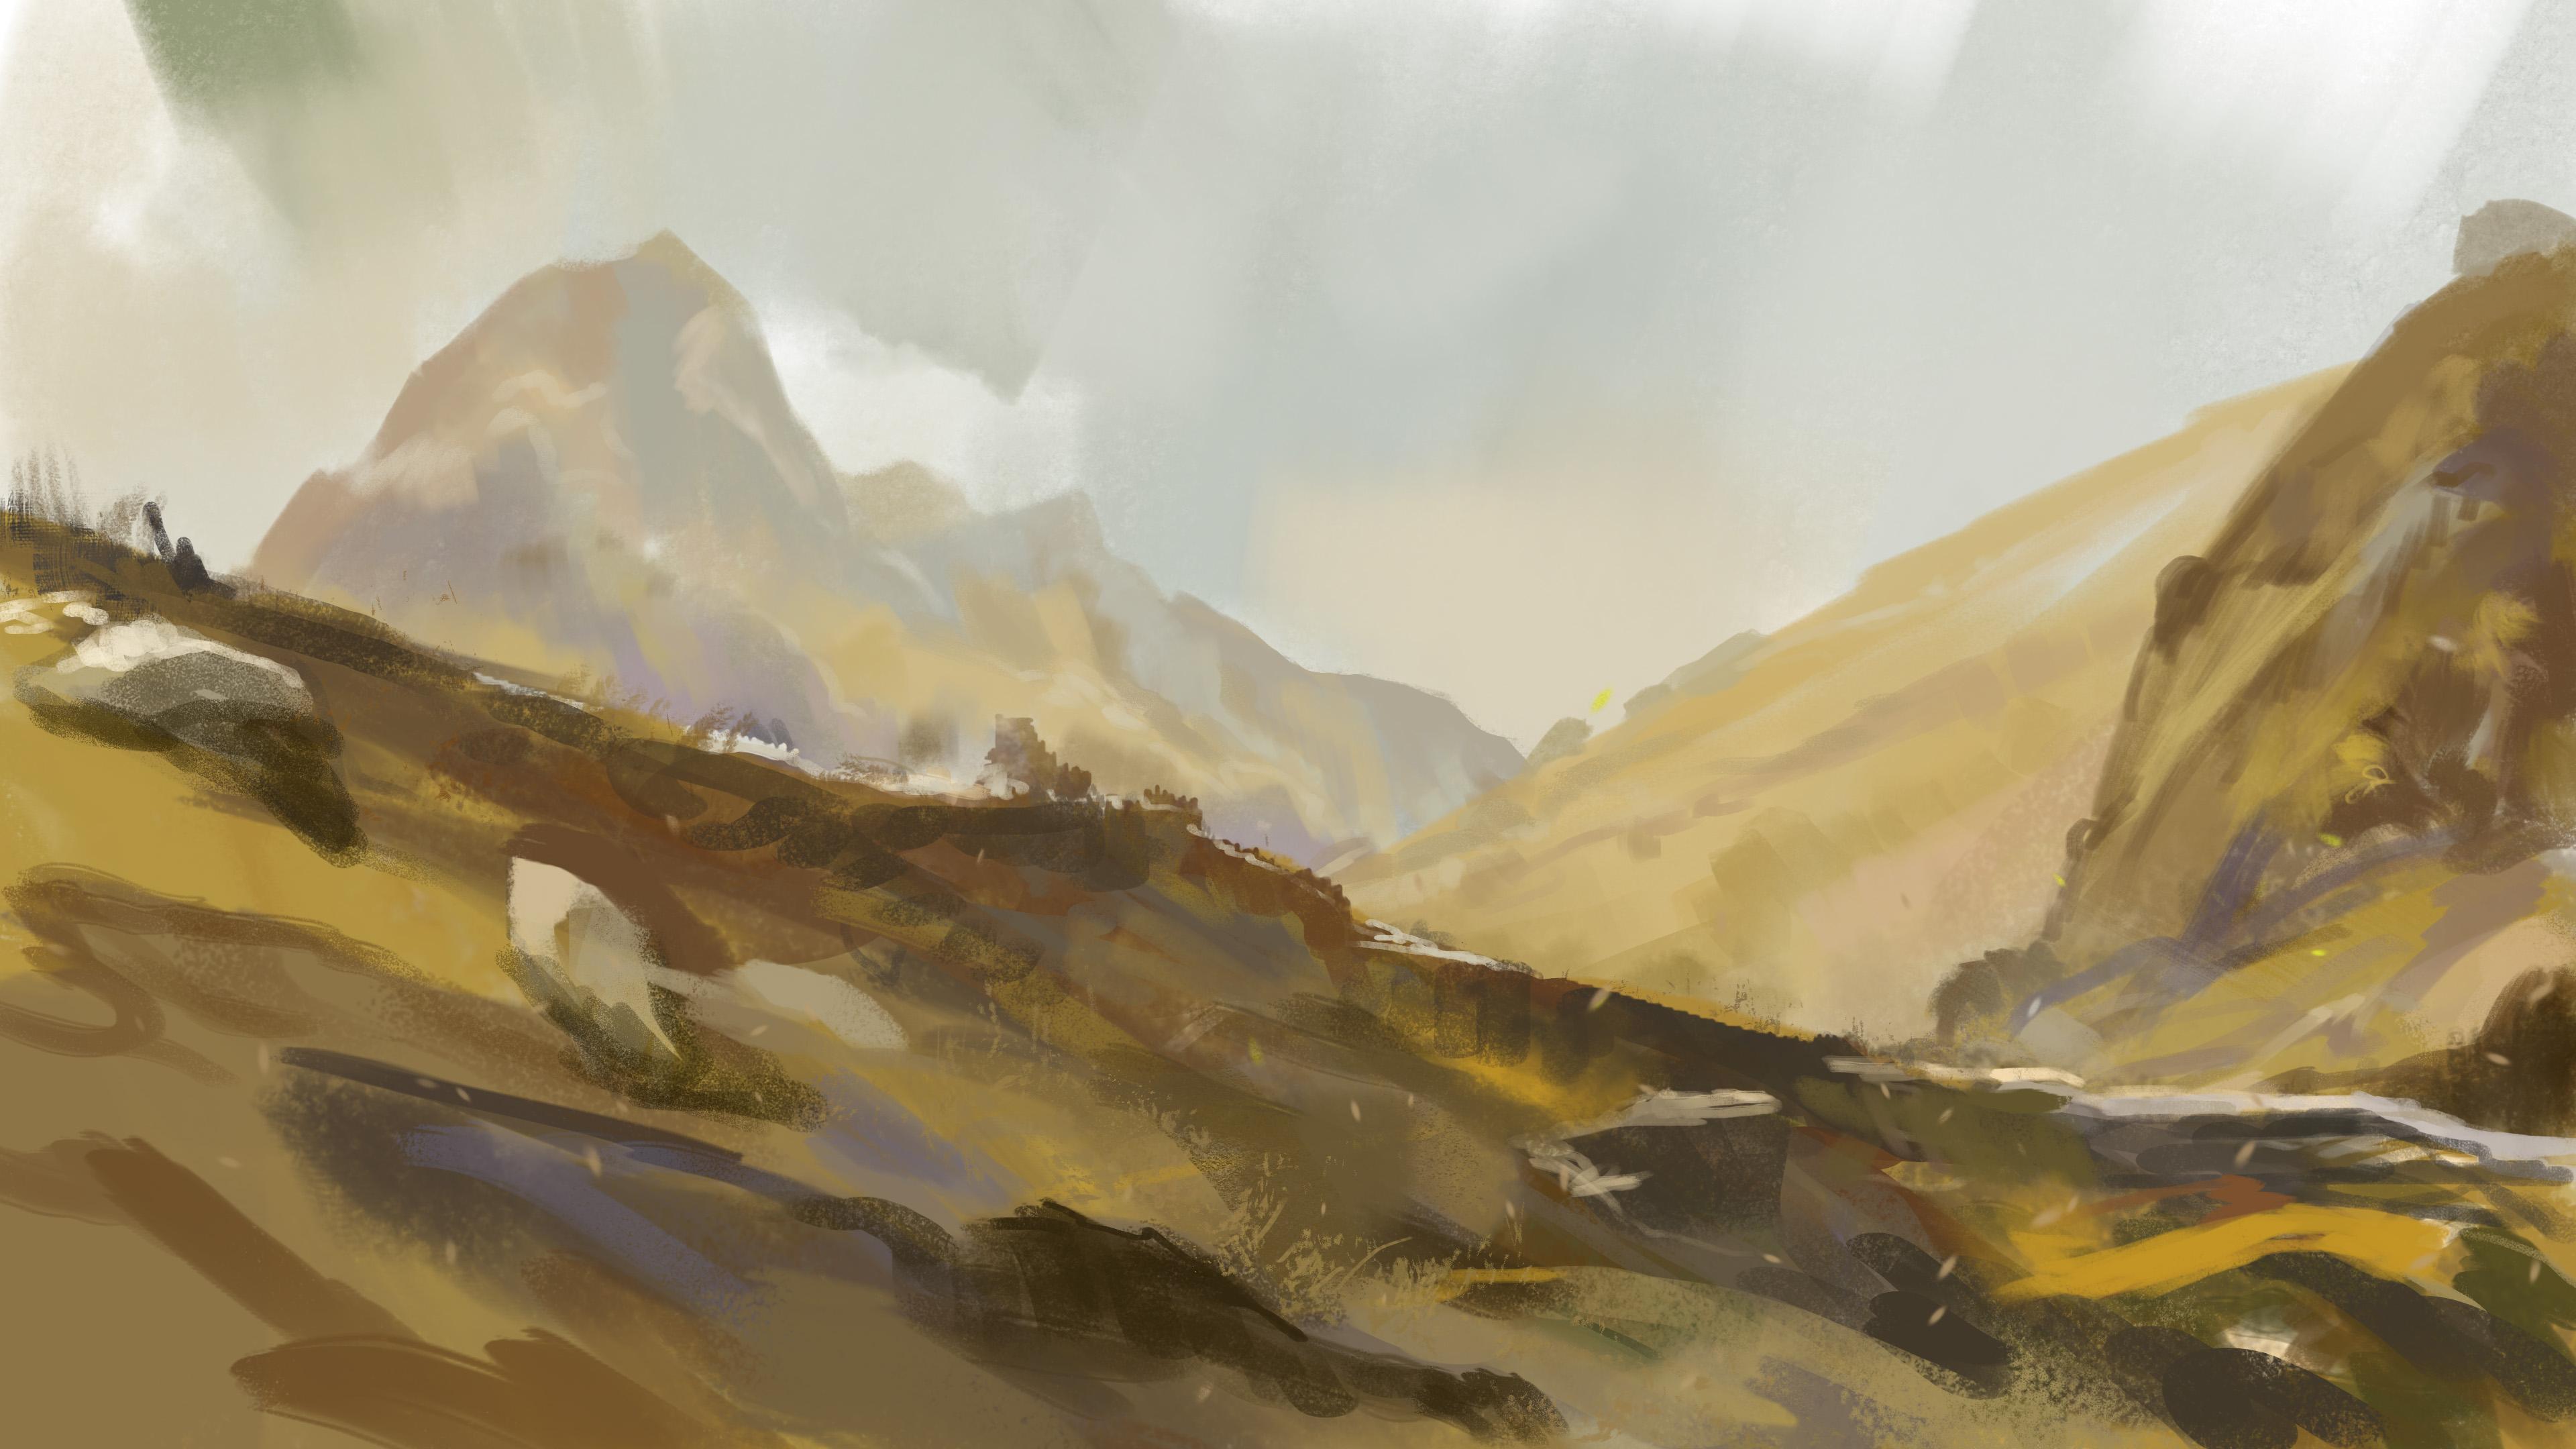 Untitled Highland Game concept